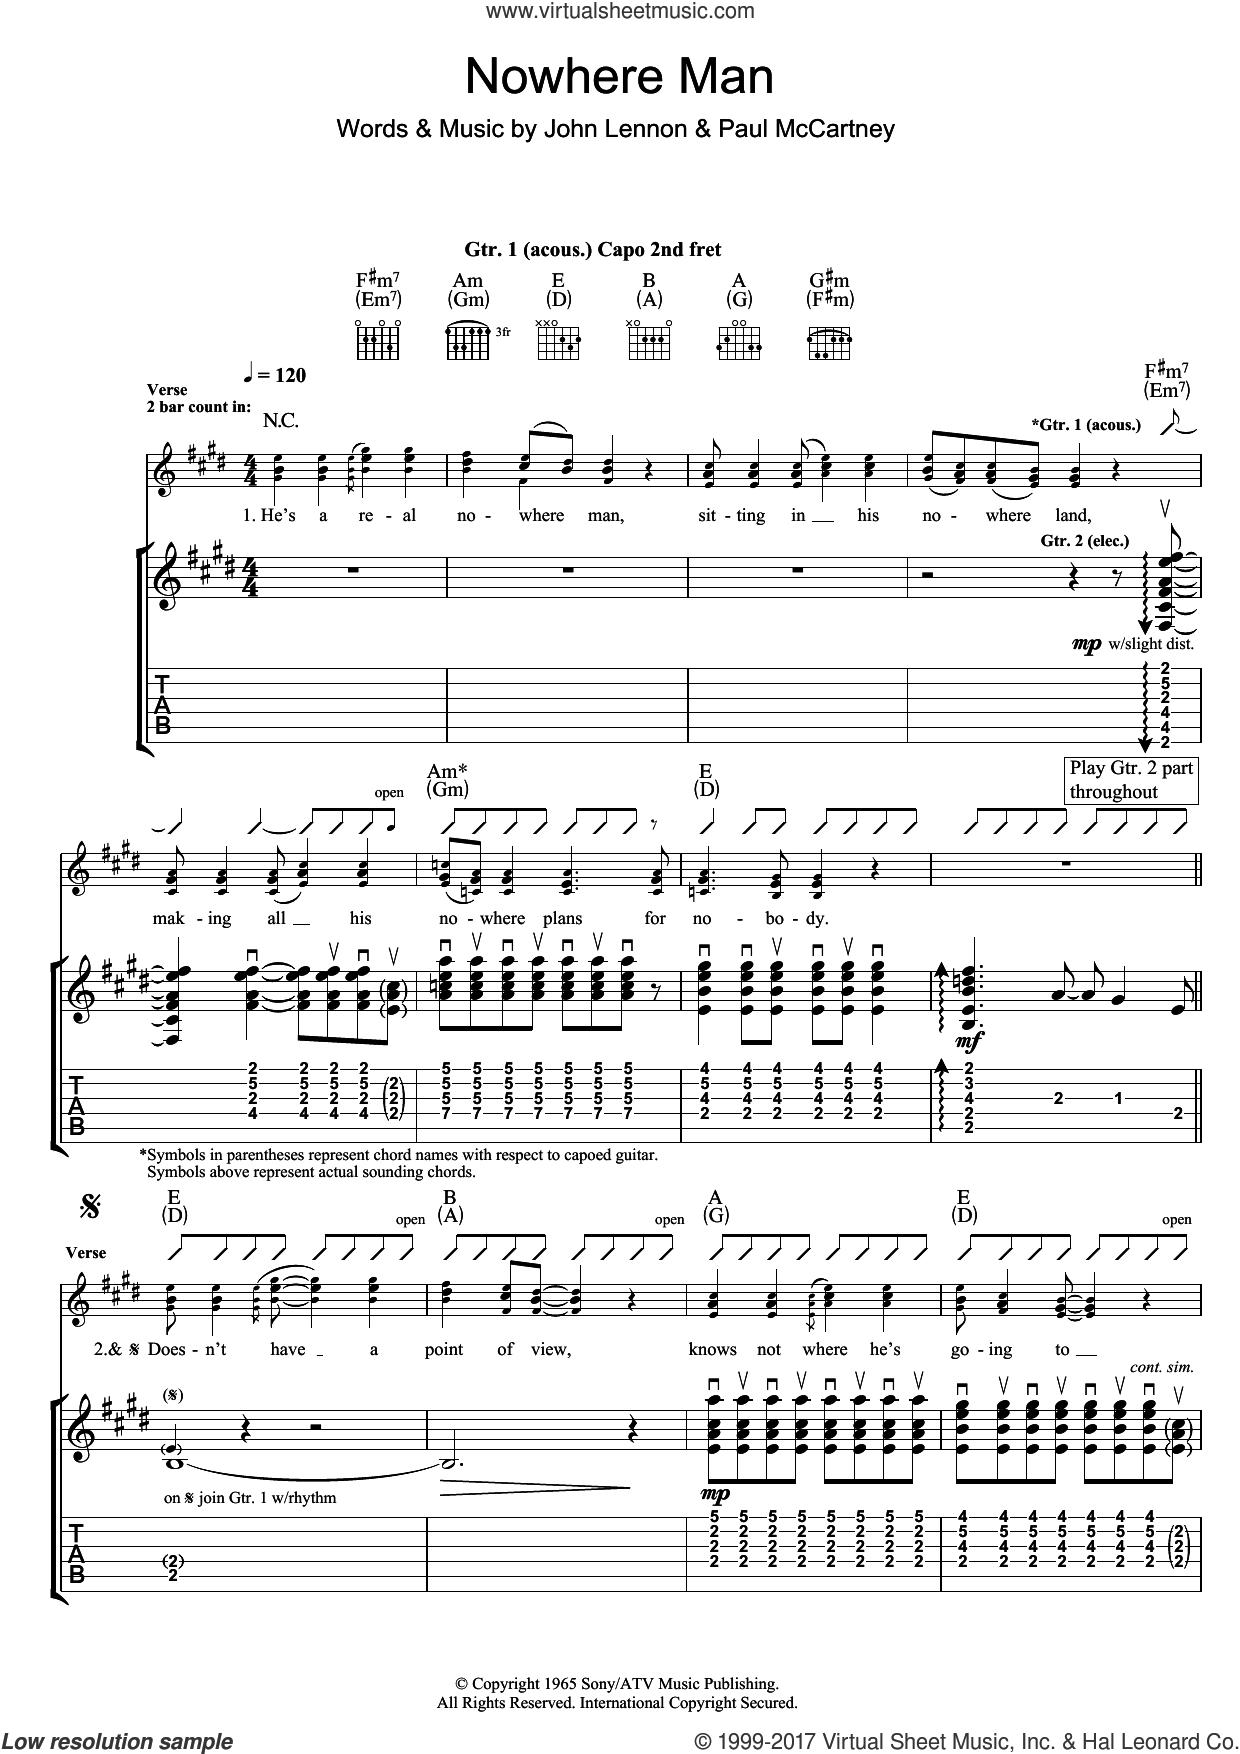 Beatles Nowhere Man Sheet Music For Guitar Tablature Pdf